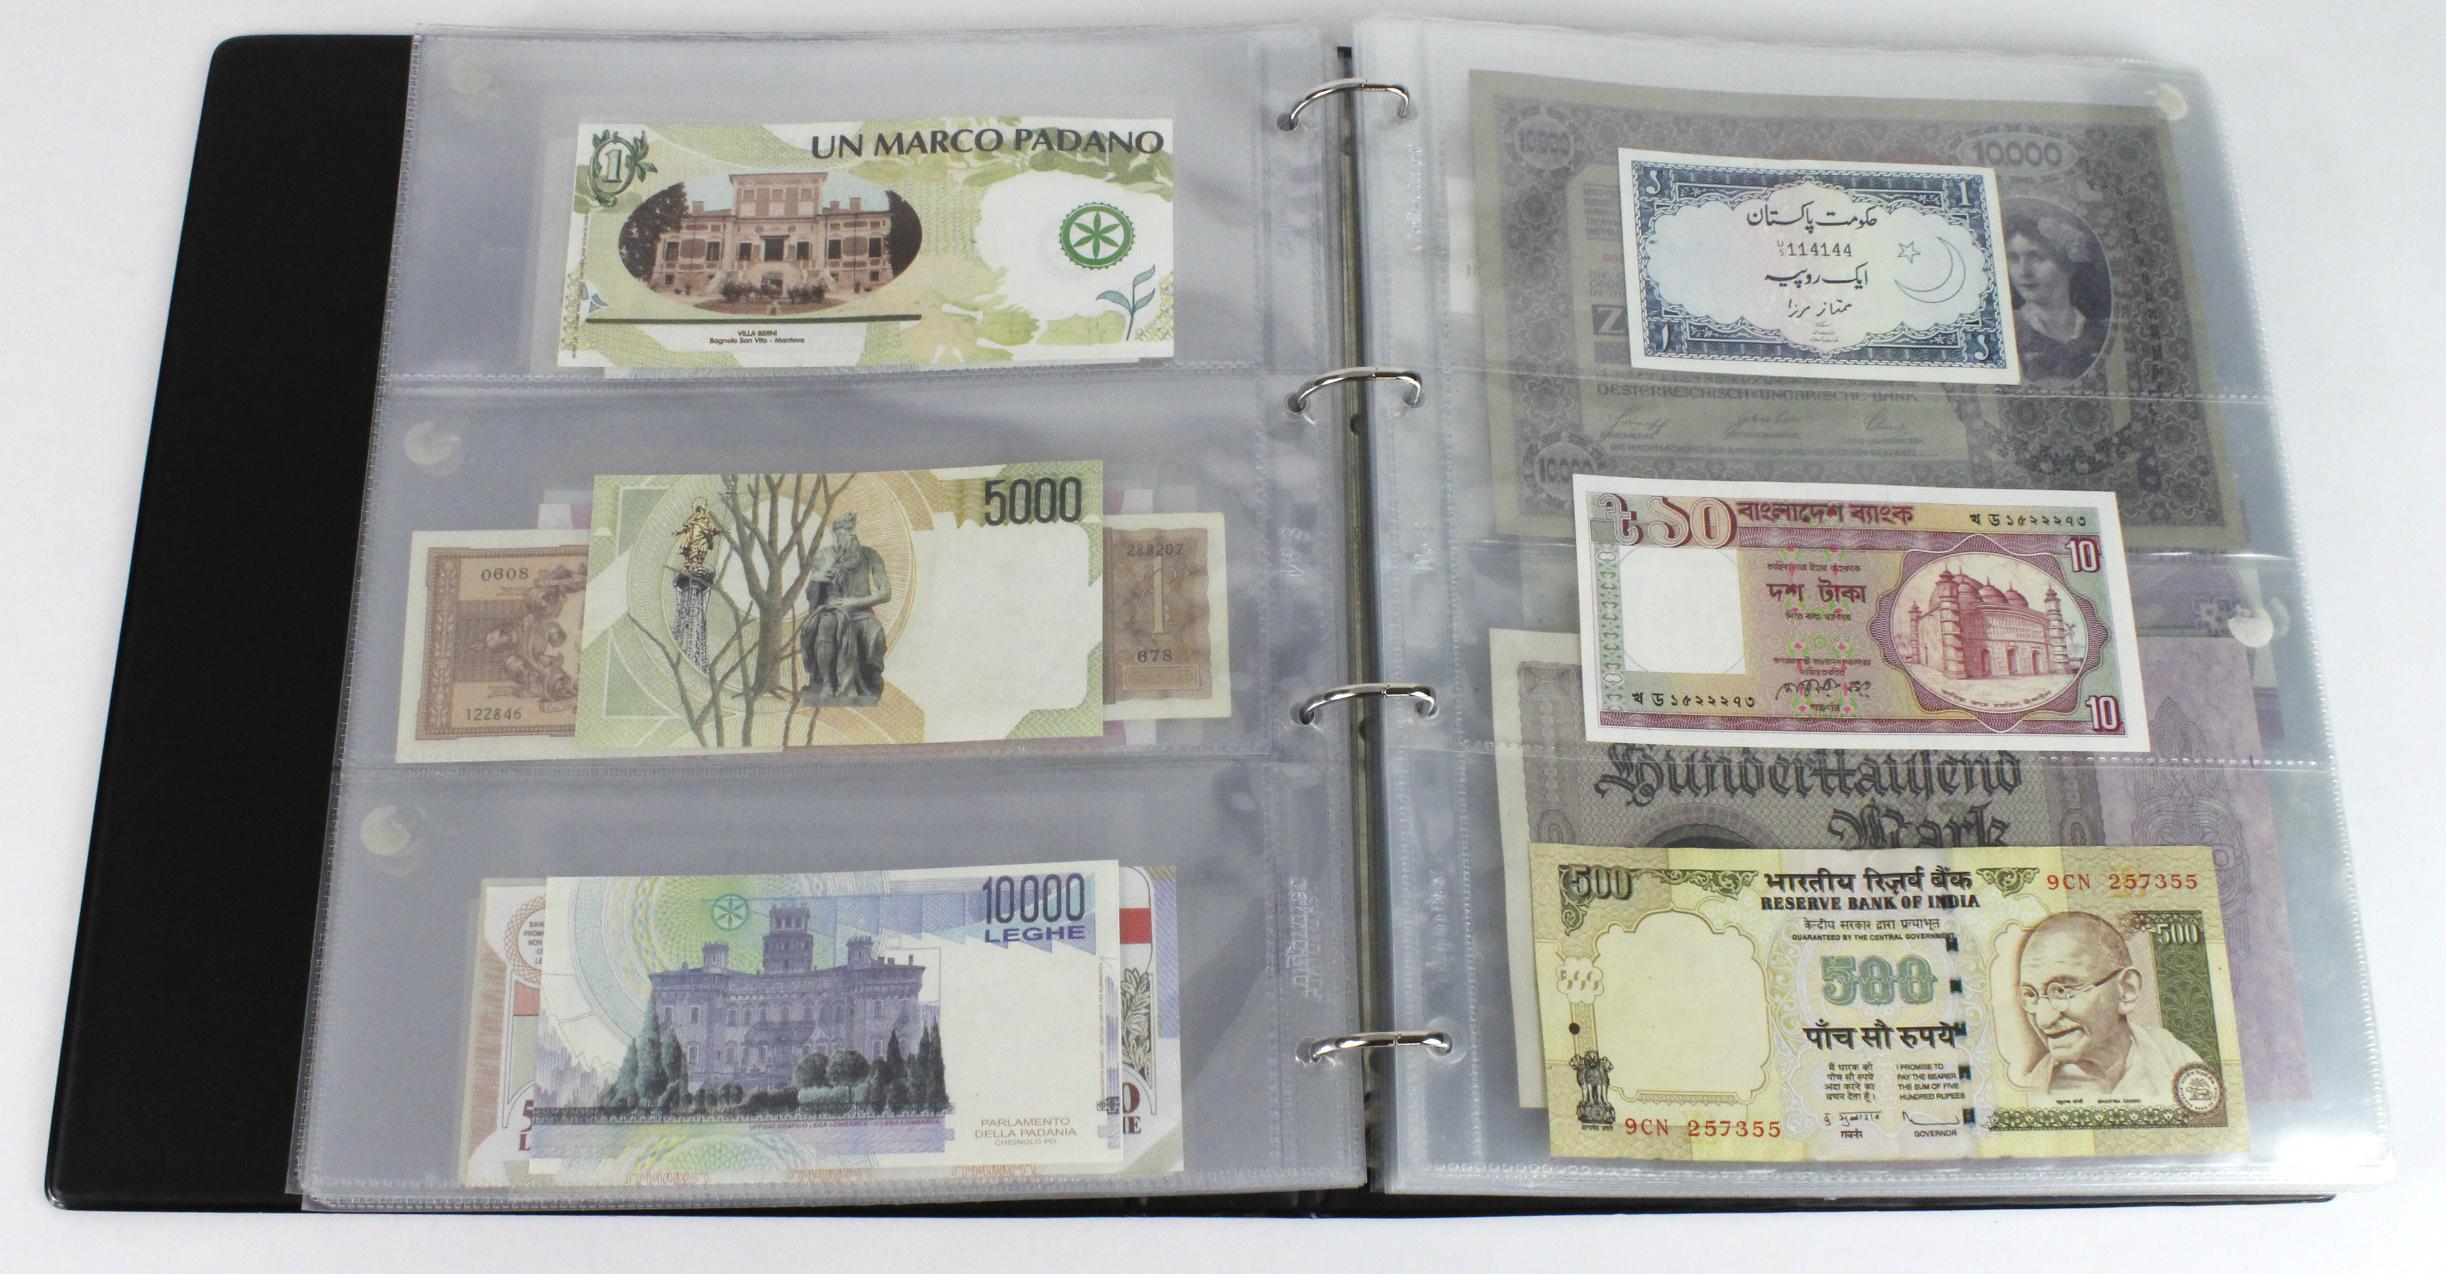 World (163), in banknote album including Bahamas, Spain, Sweden, Netherlands, Algeria, Macau, - Image 20 of 57